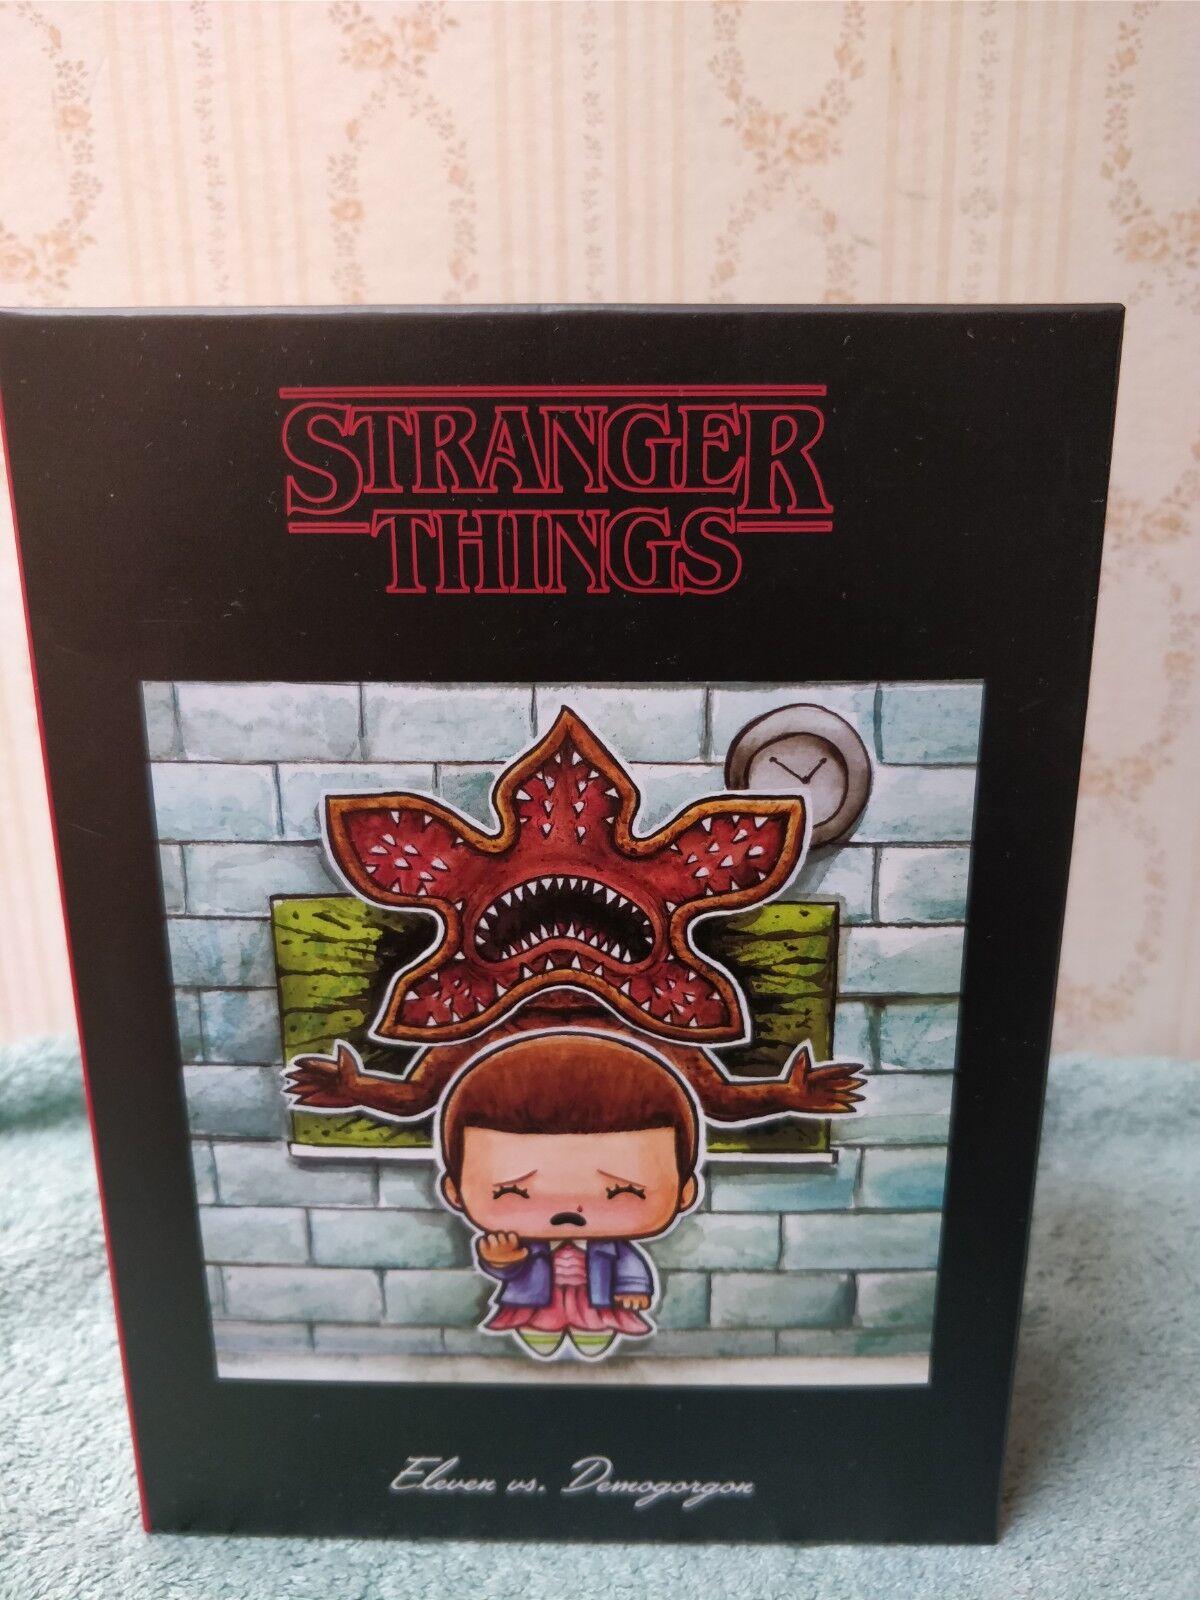 Loot Crate | Stranger Things | Eleven vs. Demogorgon | New